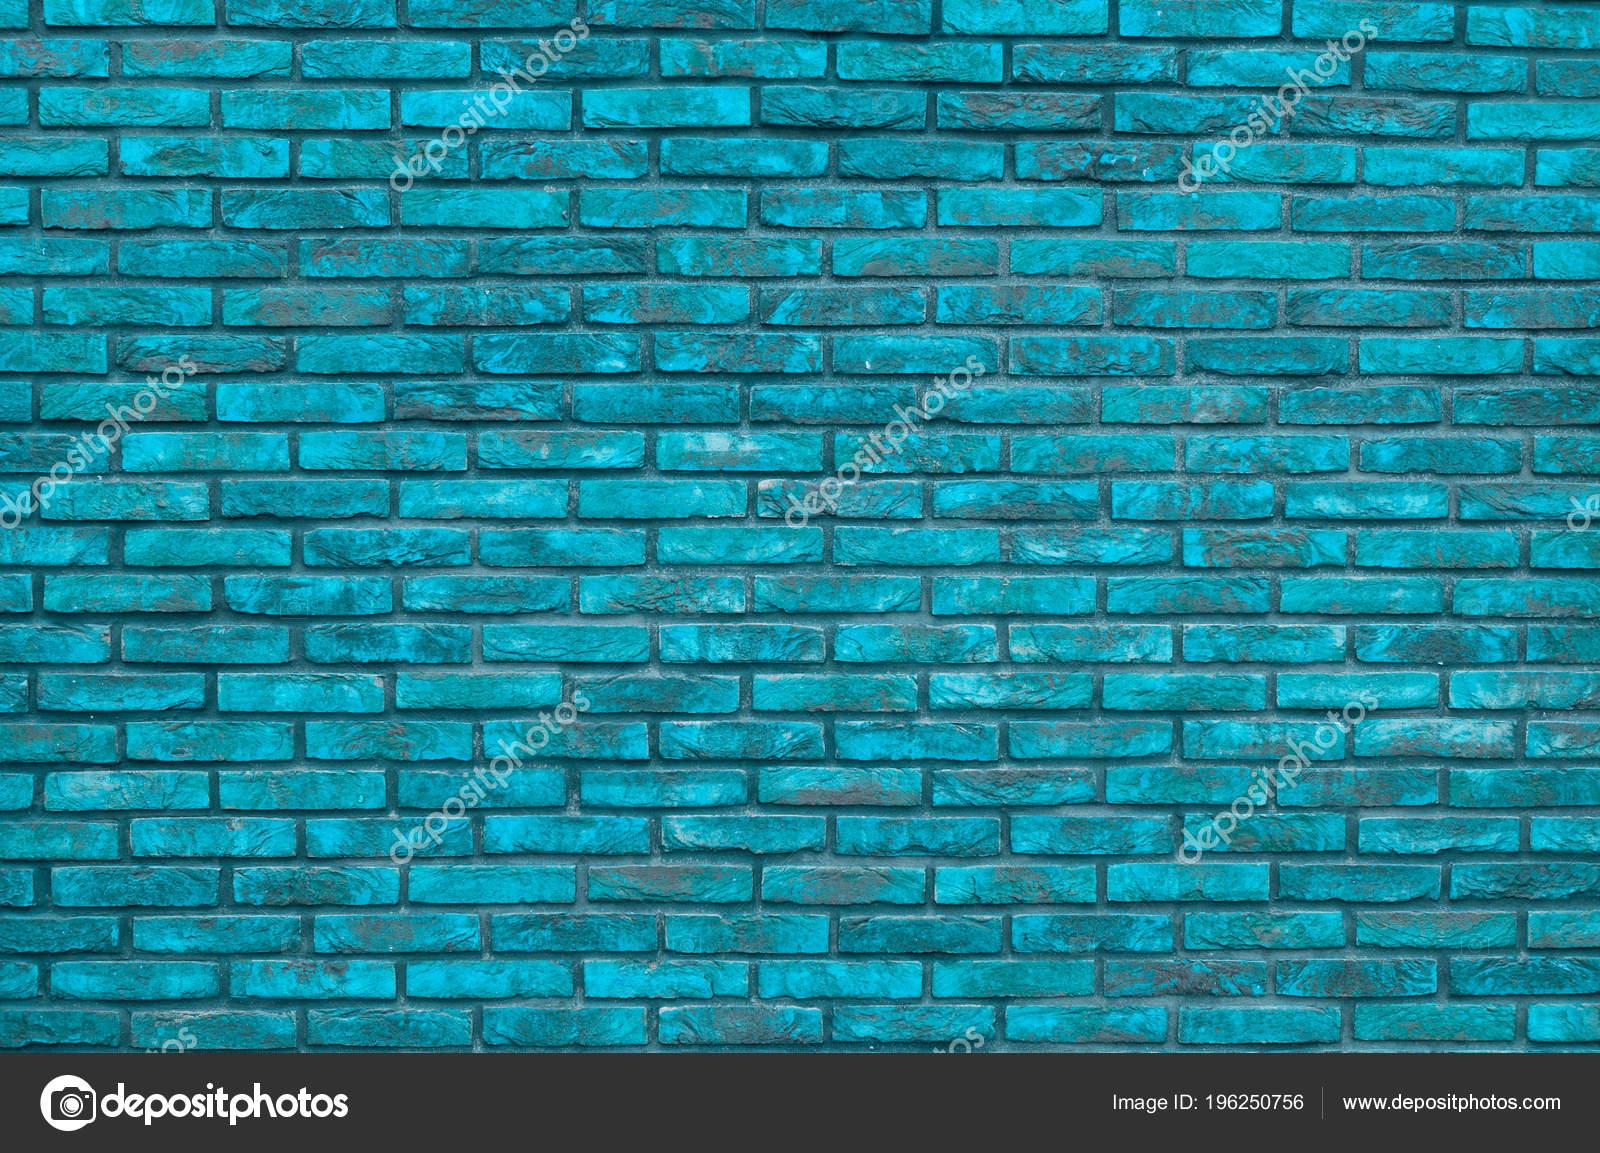 Vibrant Blue Brick Wall Background Wallpaper Bricks Pattern Texture Stock Photo